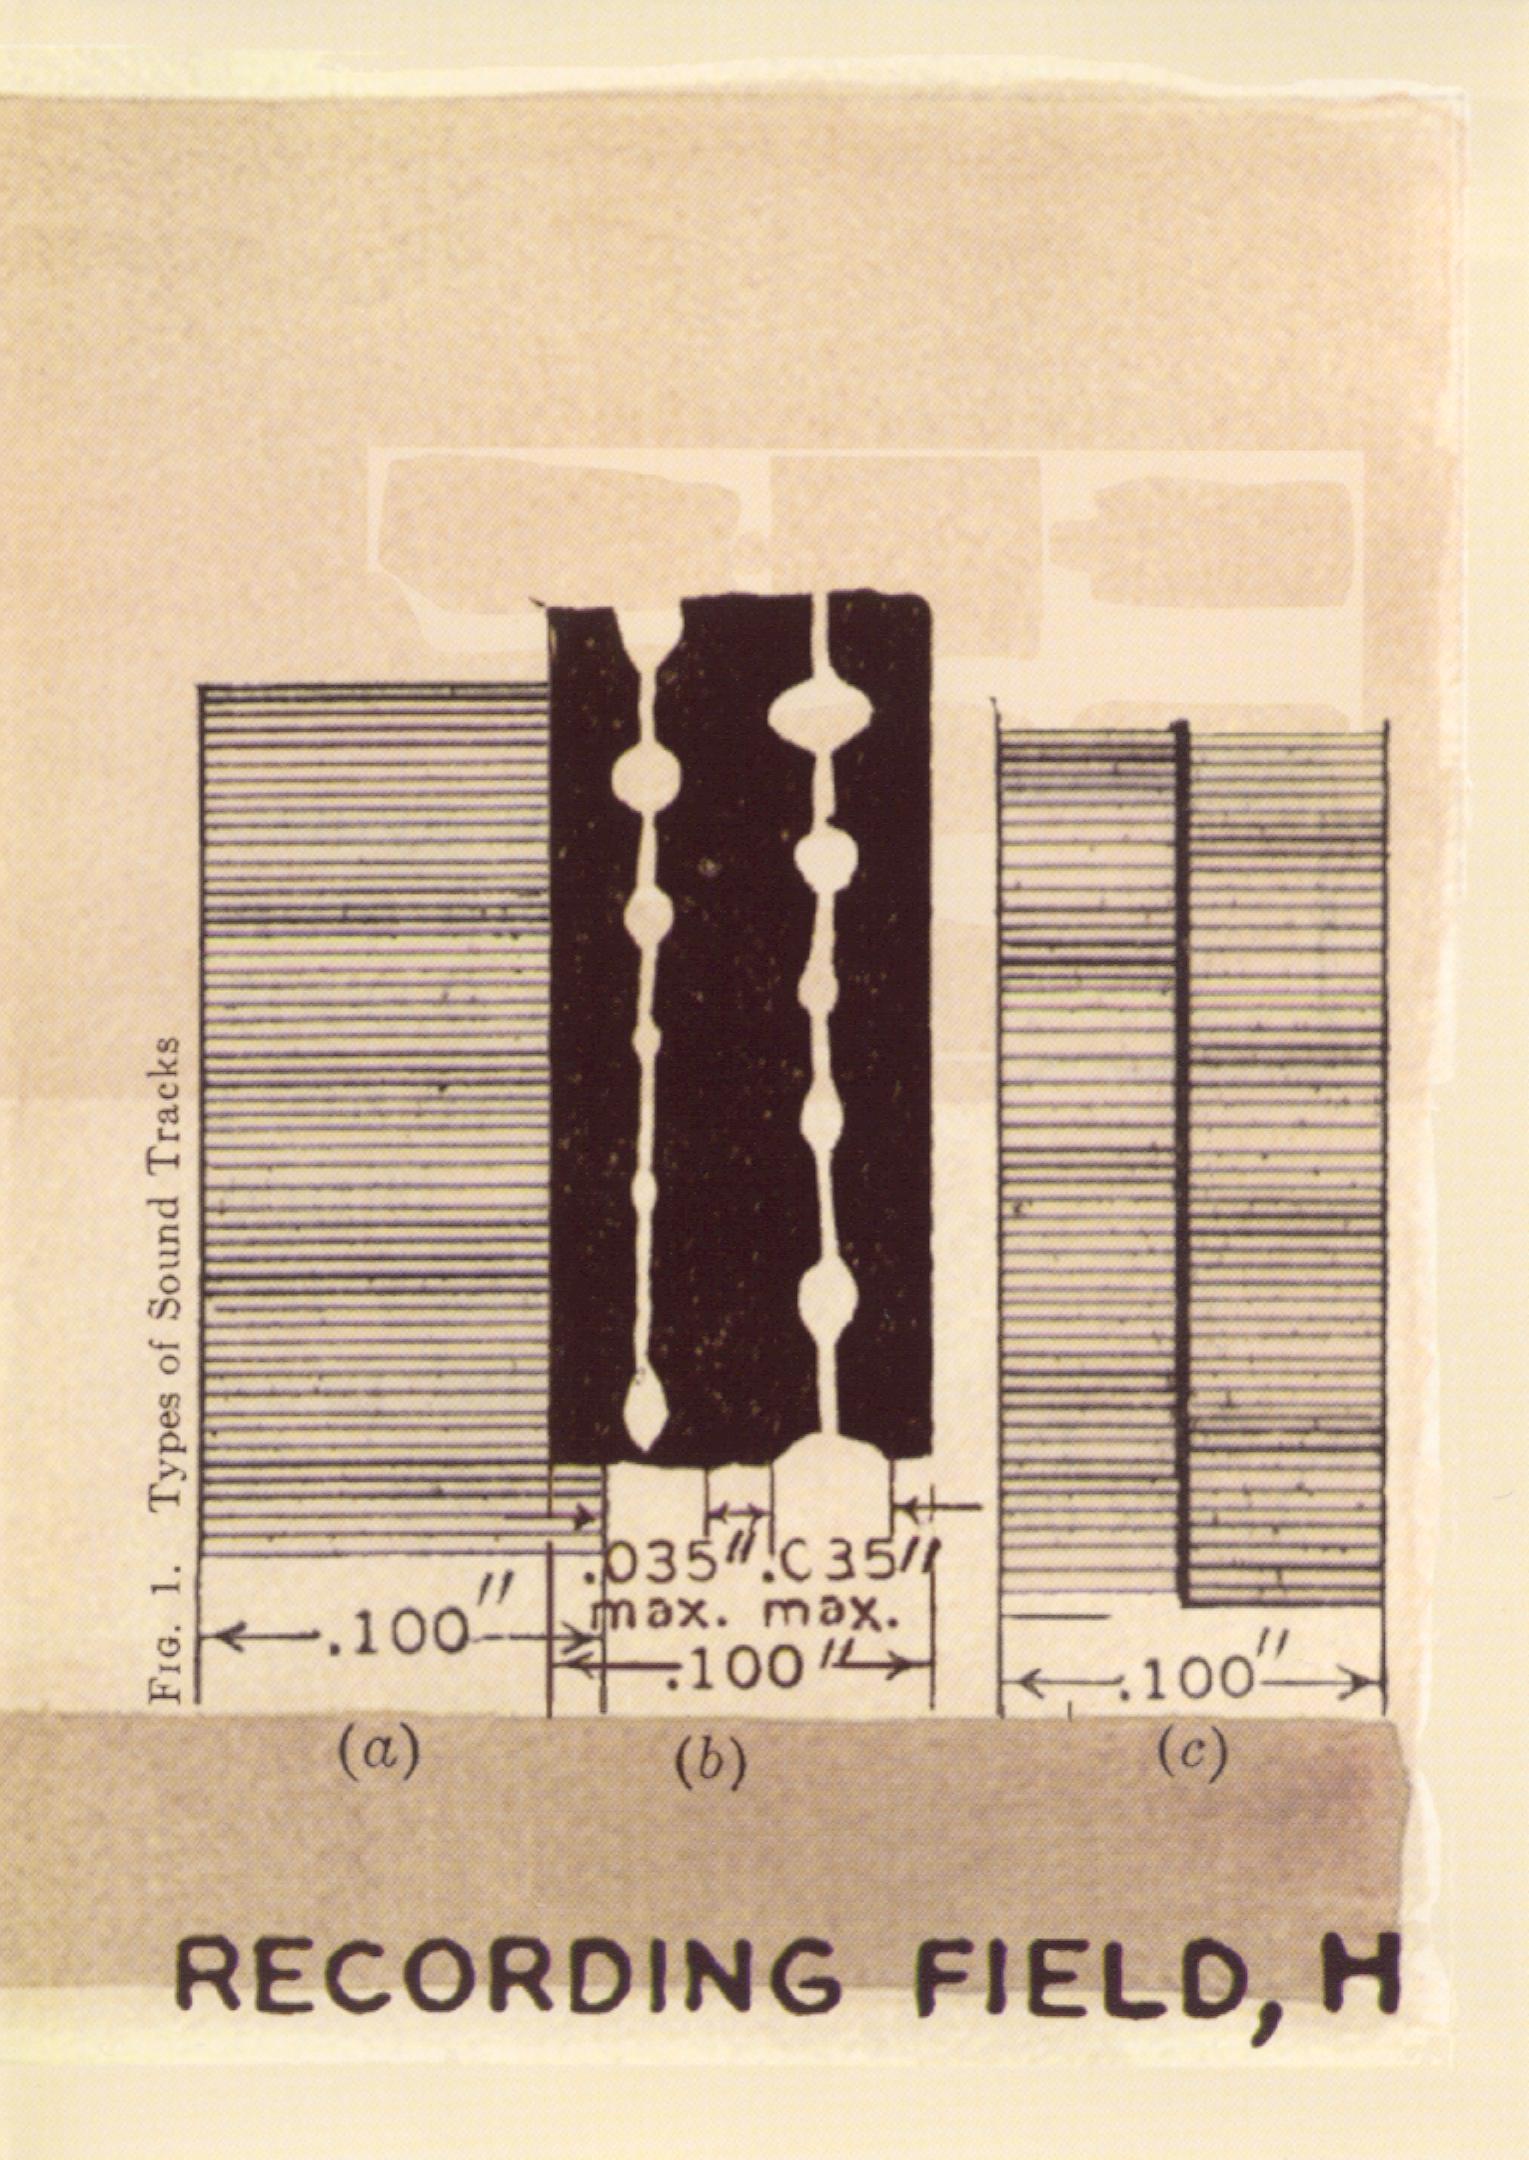 Interface: Recording Field, H